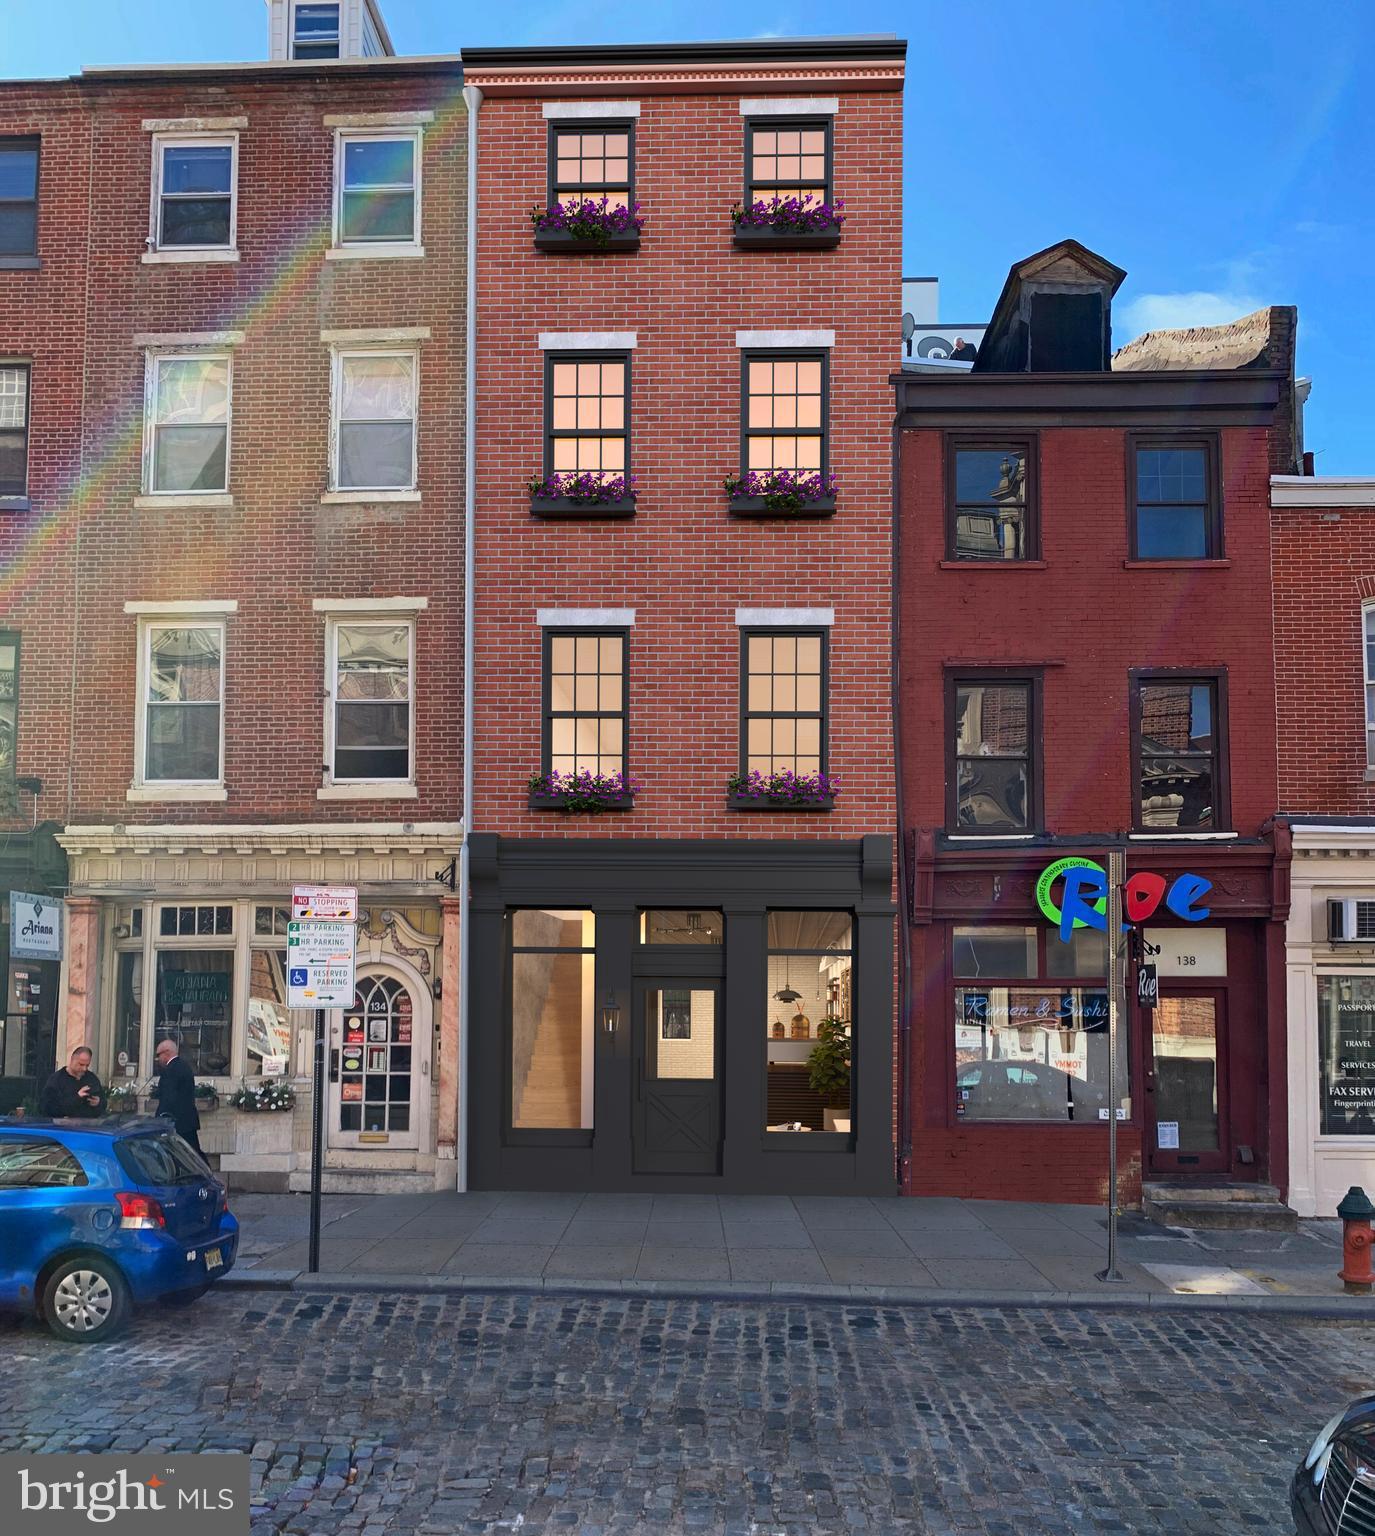 136 Chestnut St, Philadelphia, PA, 19106